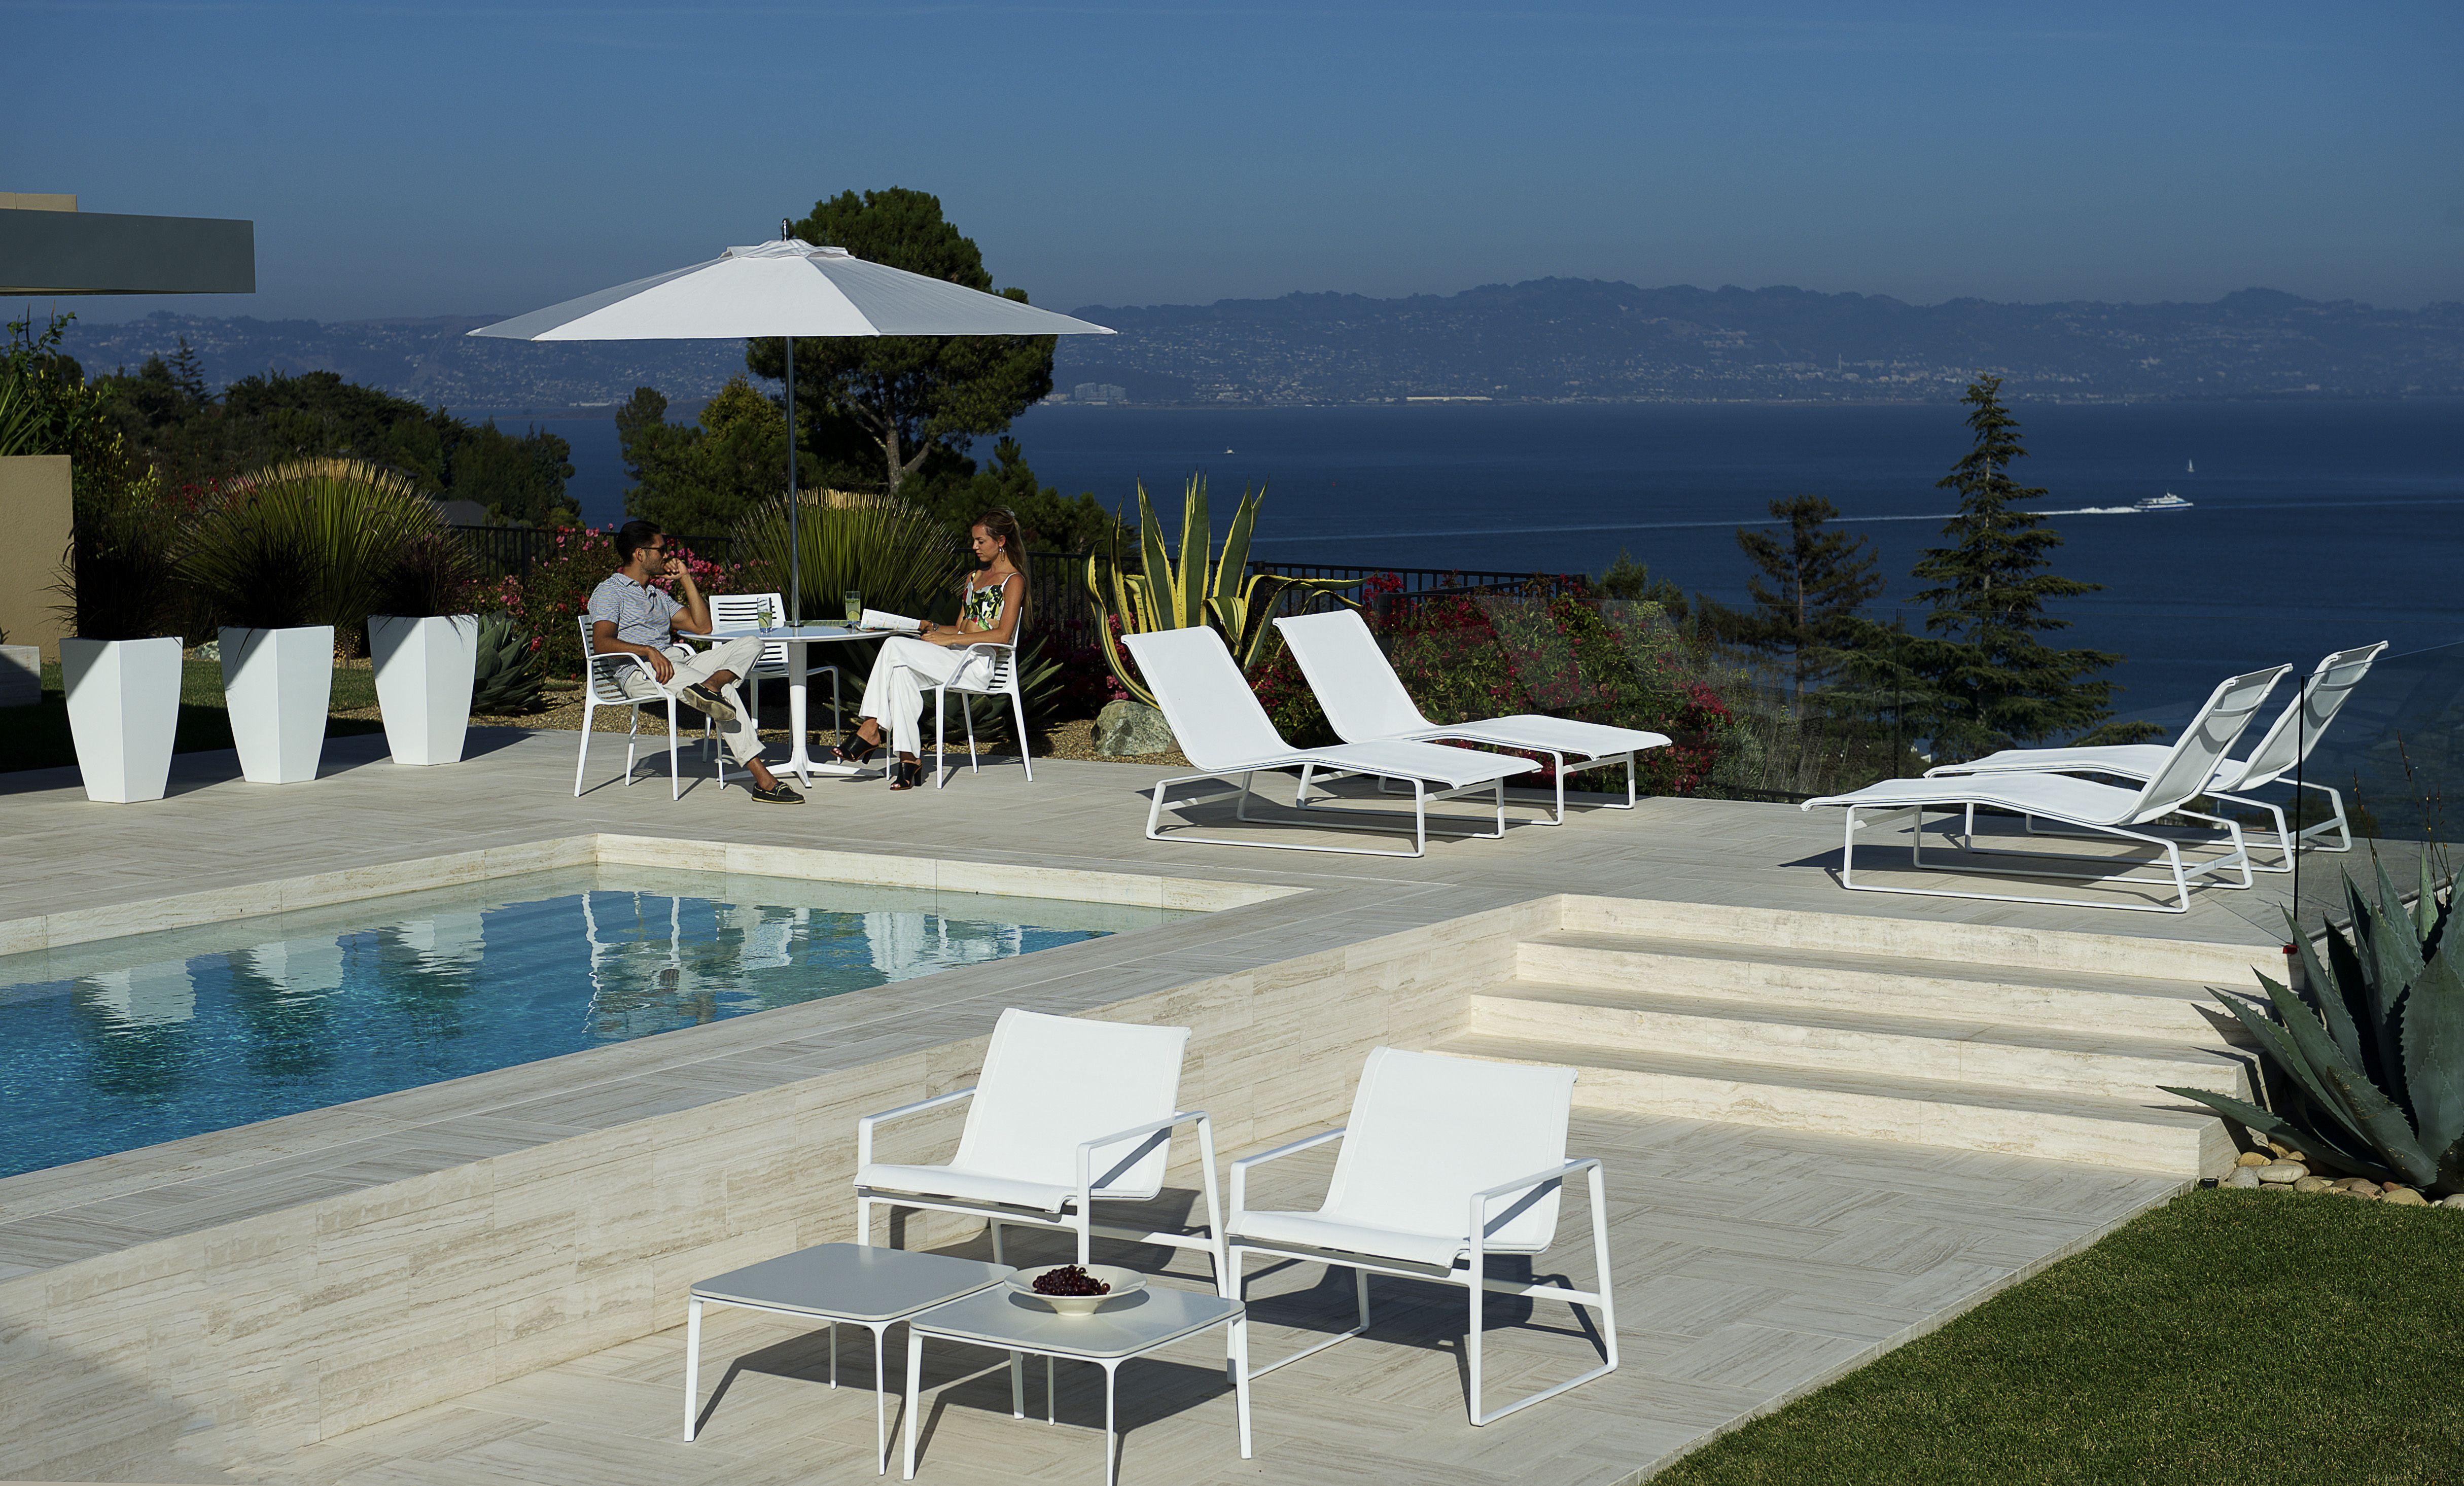 Cochran Landscapeforms Sitefurniture Outdoorfurniture Landscapearchitect Elegant Outdoor Furniture Outdoor Furniture Design Outdoor Tables